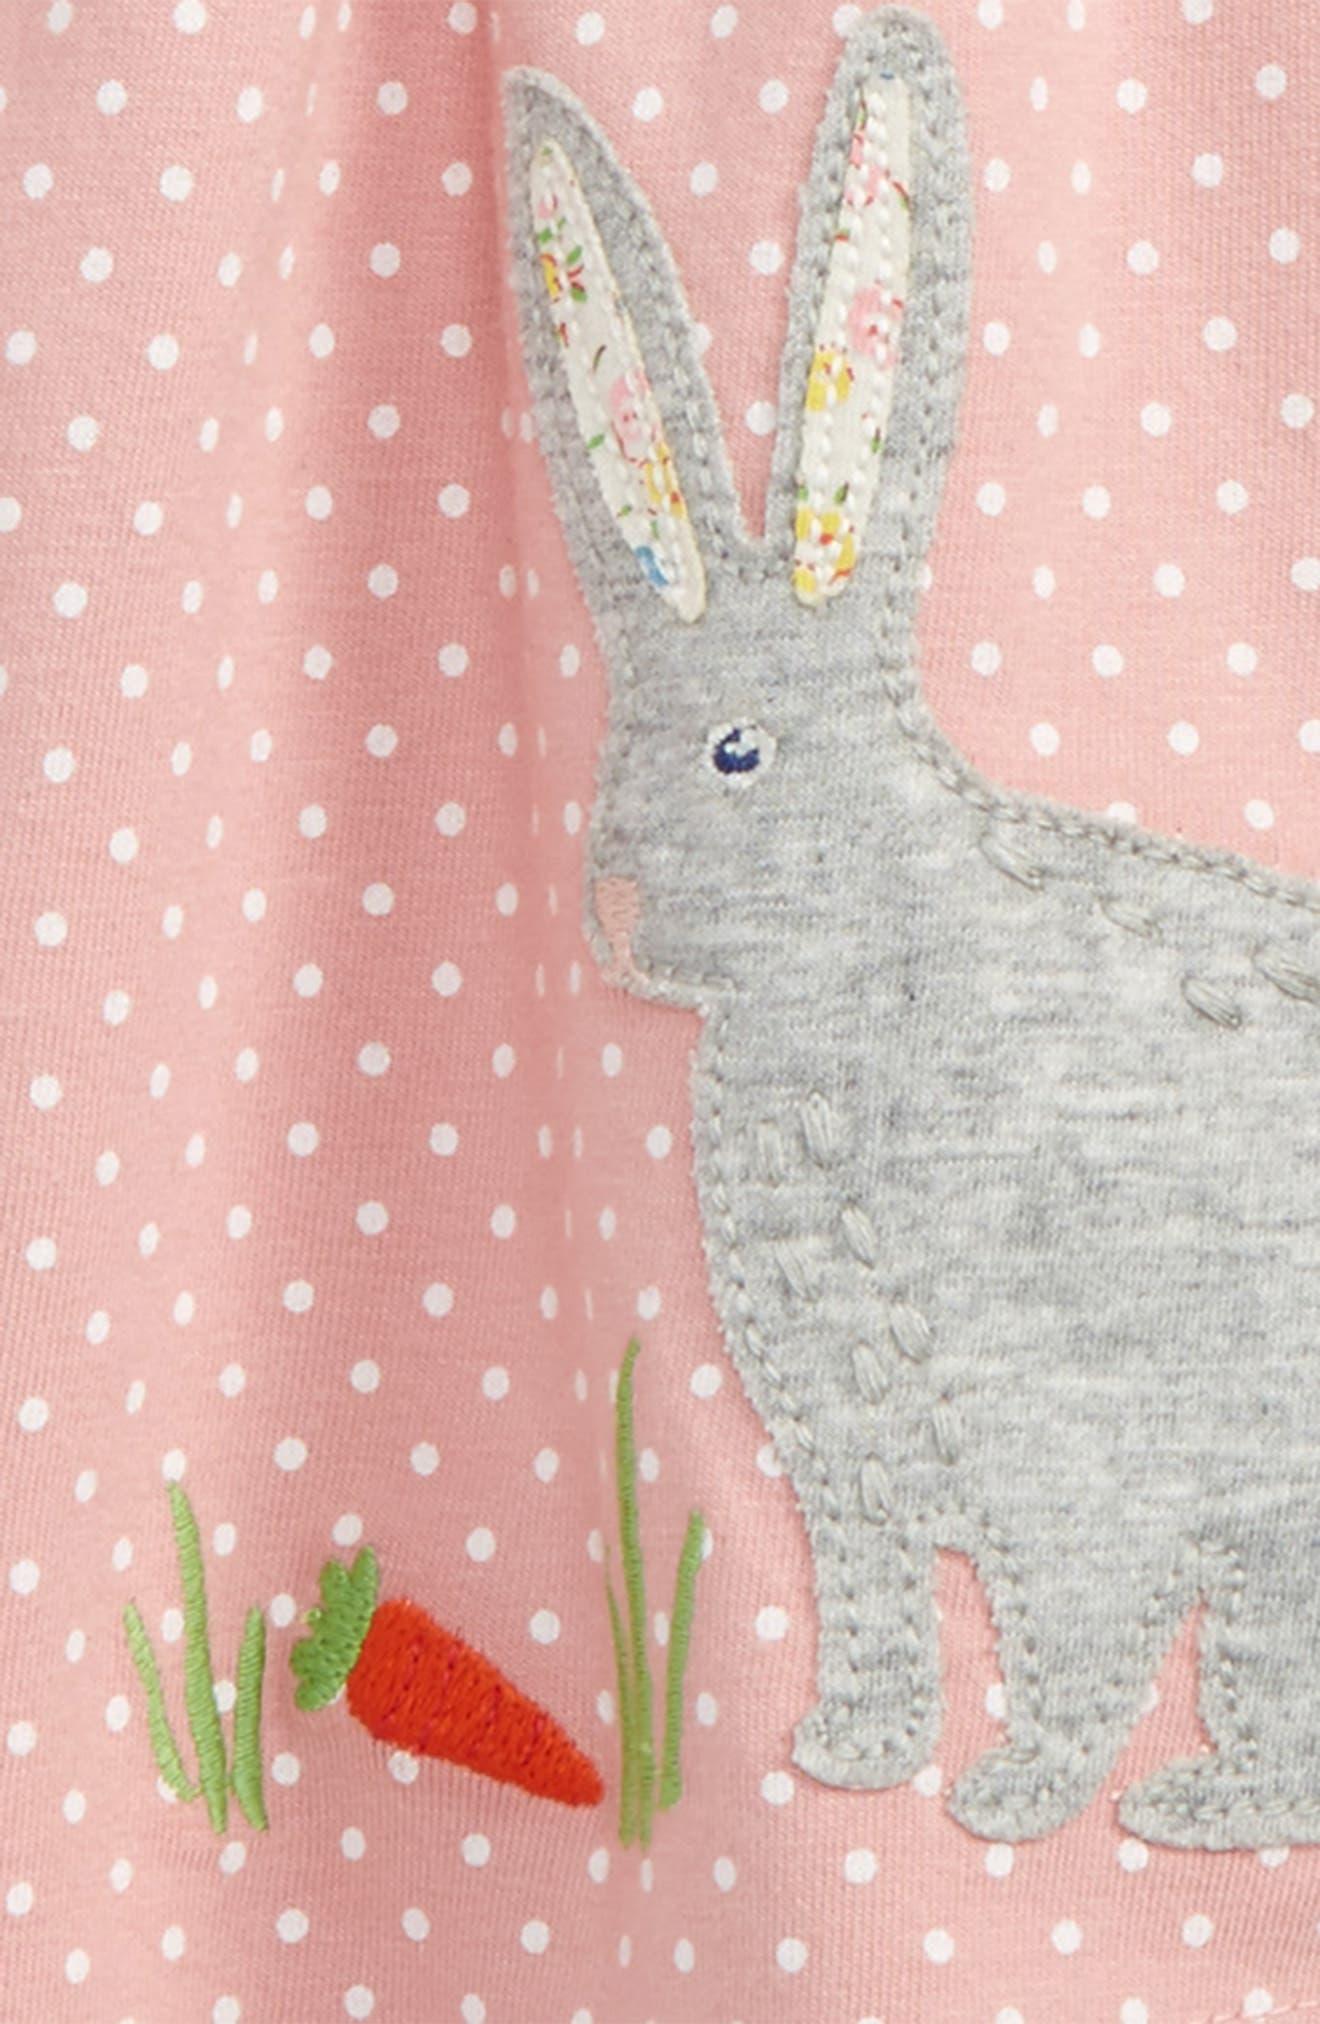 Appliqué Dress & Leggings Set,                             Alternate thumbnail 2, color,                             Almond Blossom Pink Pin Spot